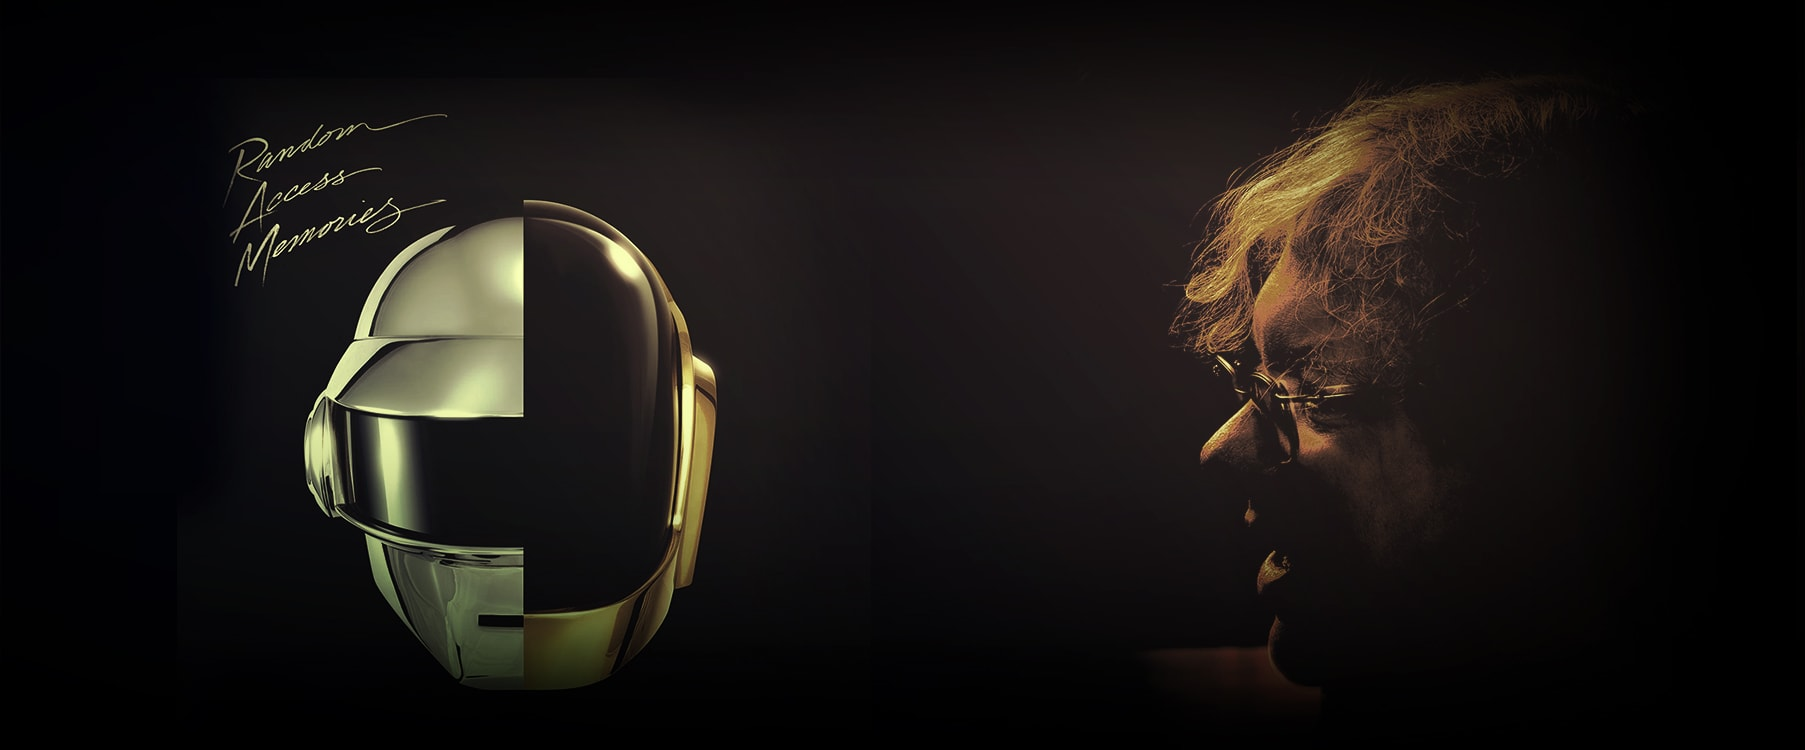 "Mick Guzauski On Mixing Daft Punk's ""Random Access Memories"" with Universal Audio"